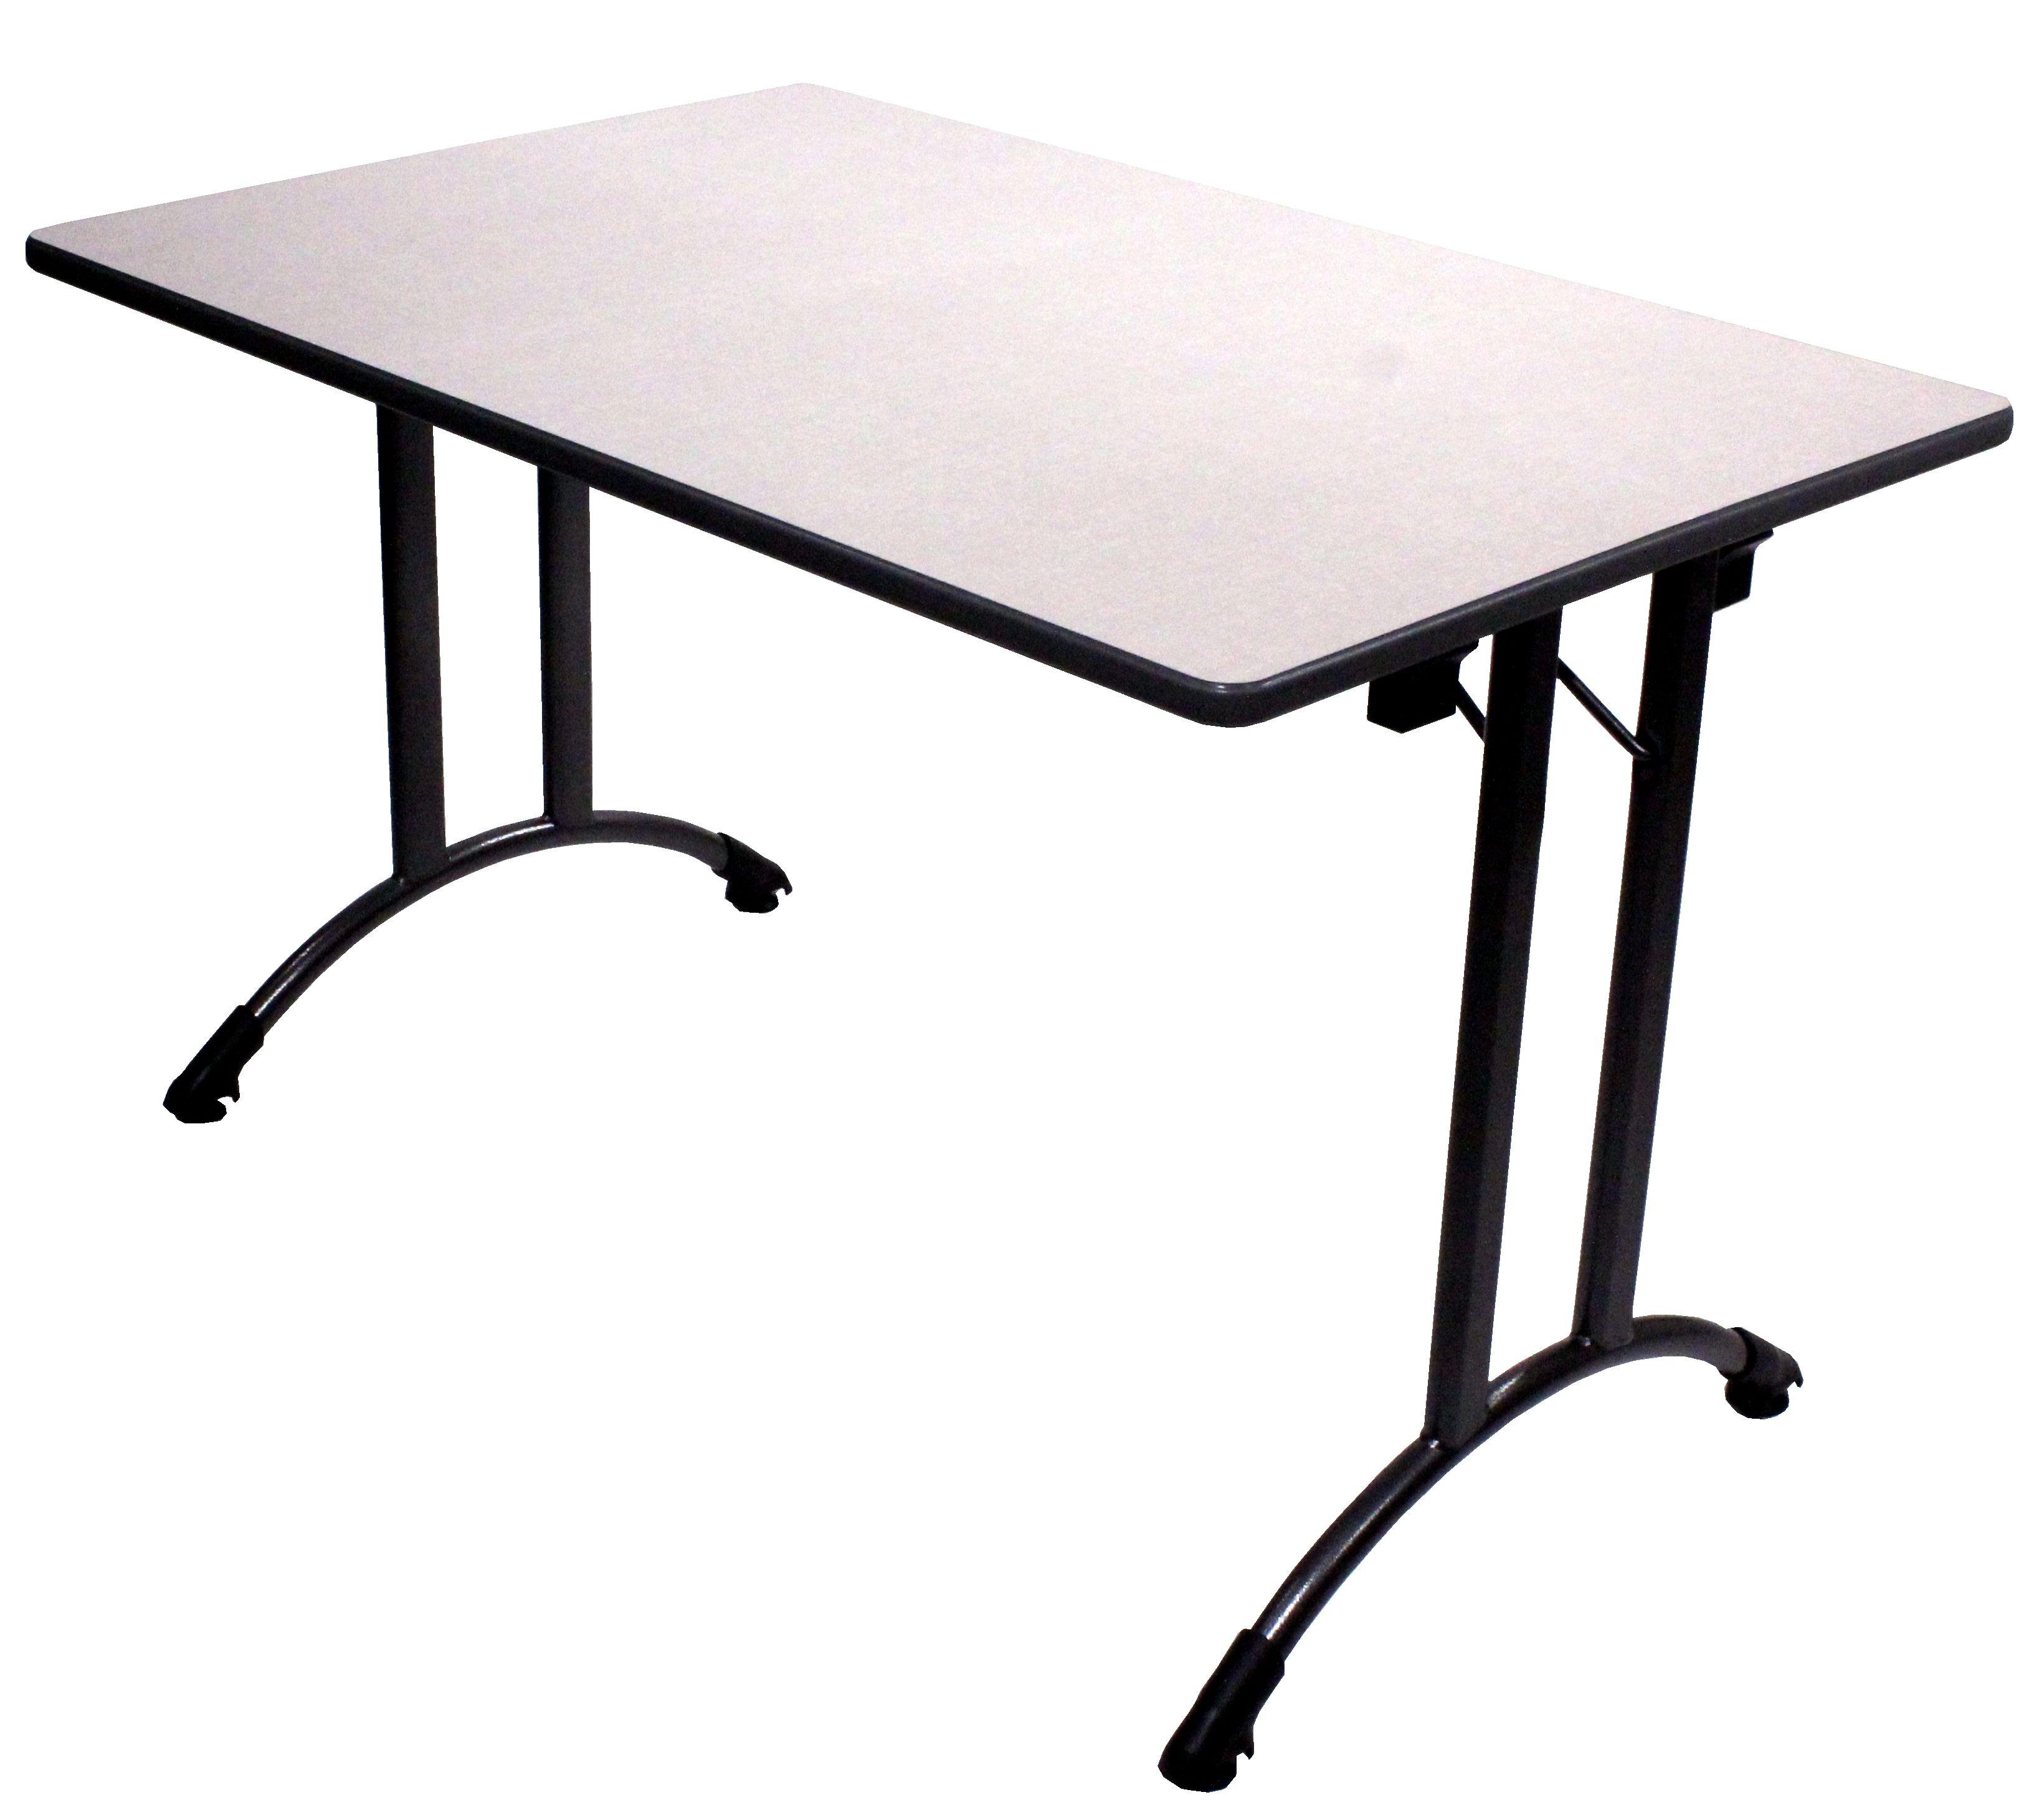 Beau TABLE ALSACE DEGAGEMENT LATERAL PLIANTE PLATEAU STRATIFIE #table  #degagementlateral #salleamanger #restauration #metal #stratifie